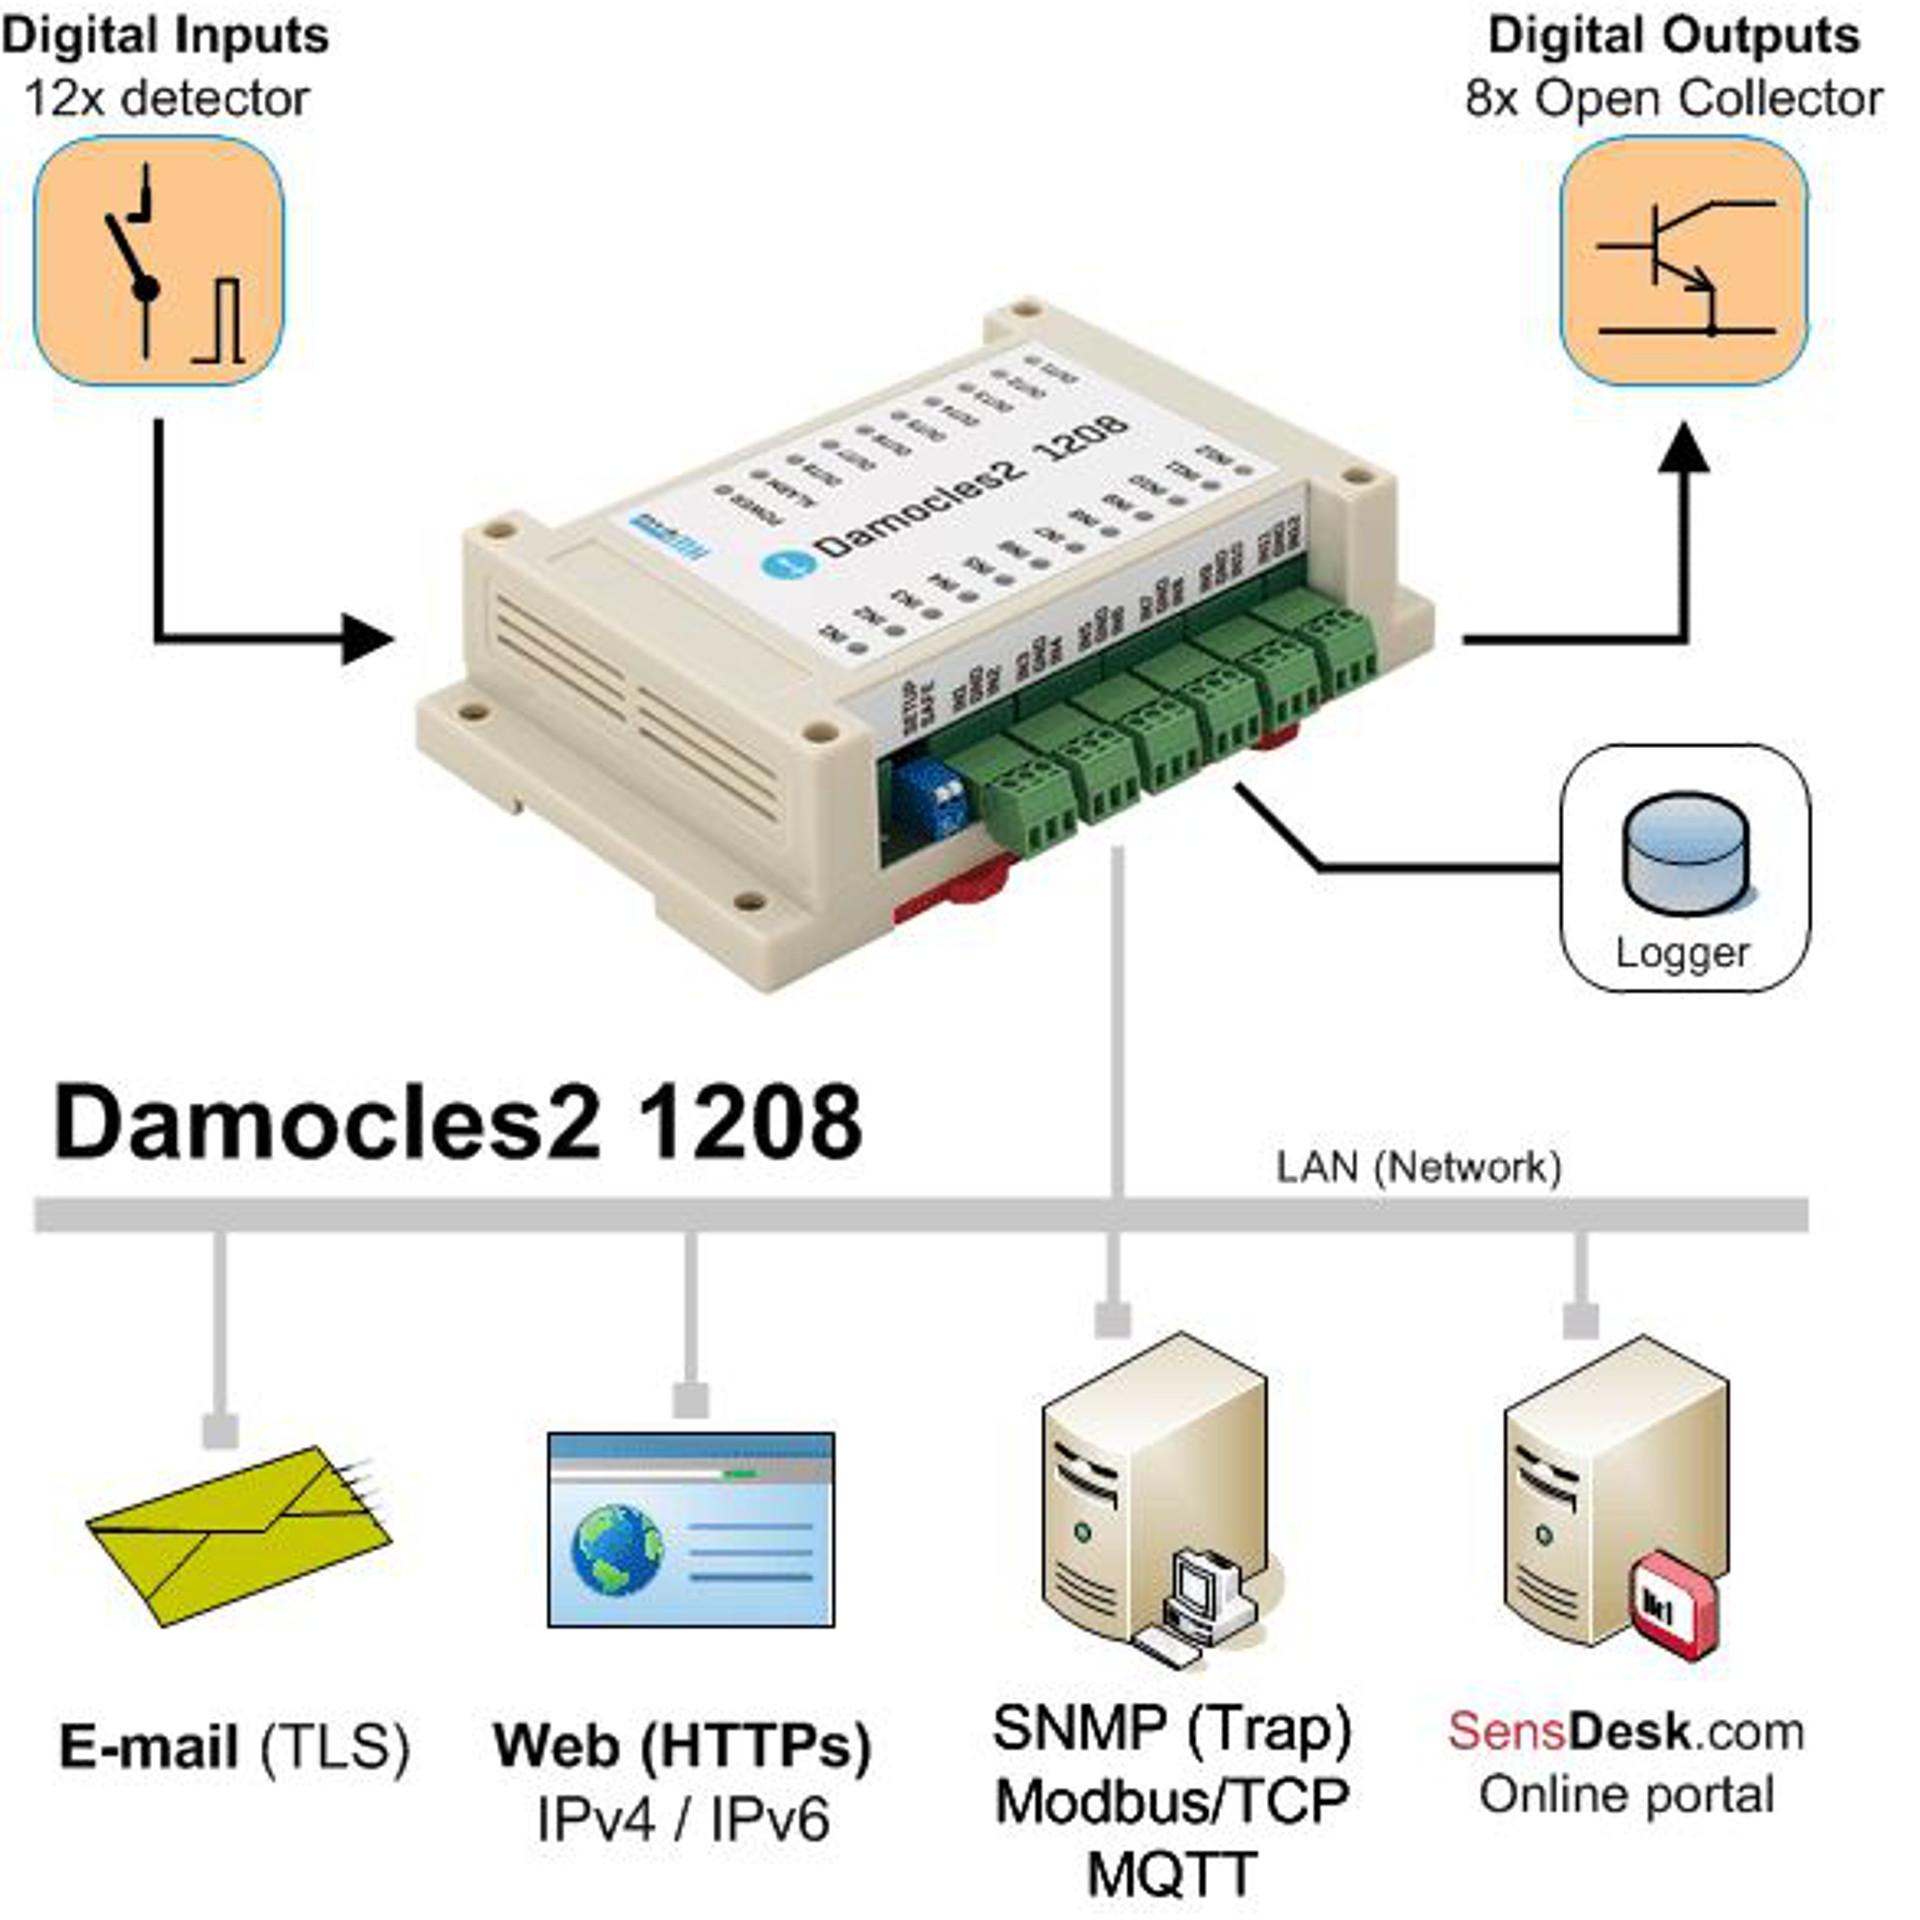 Damocles2 1208 - Sichere Ethernet I/O Einheit - HW group - BellEquip